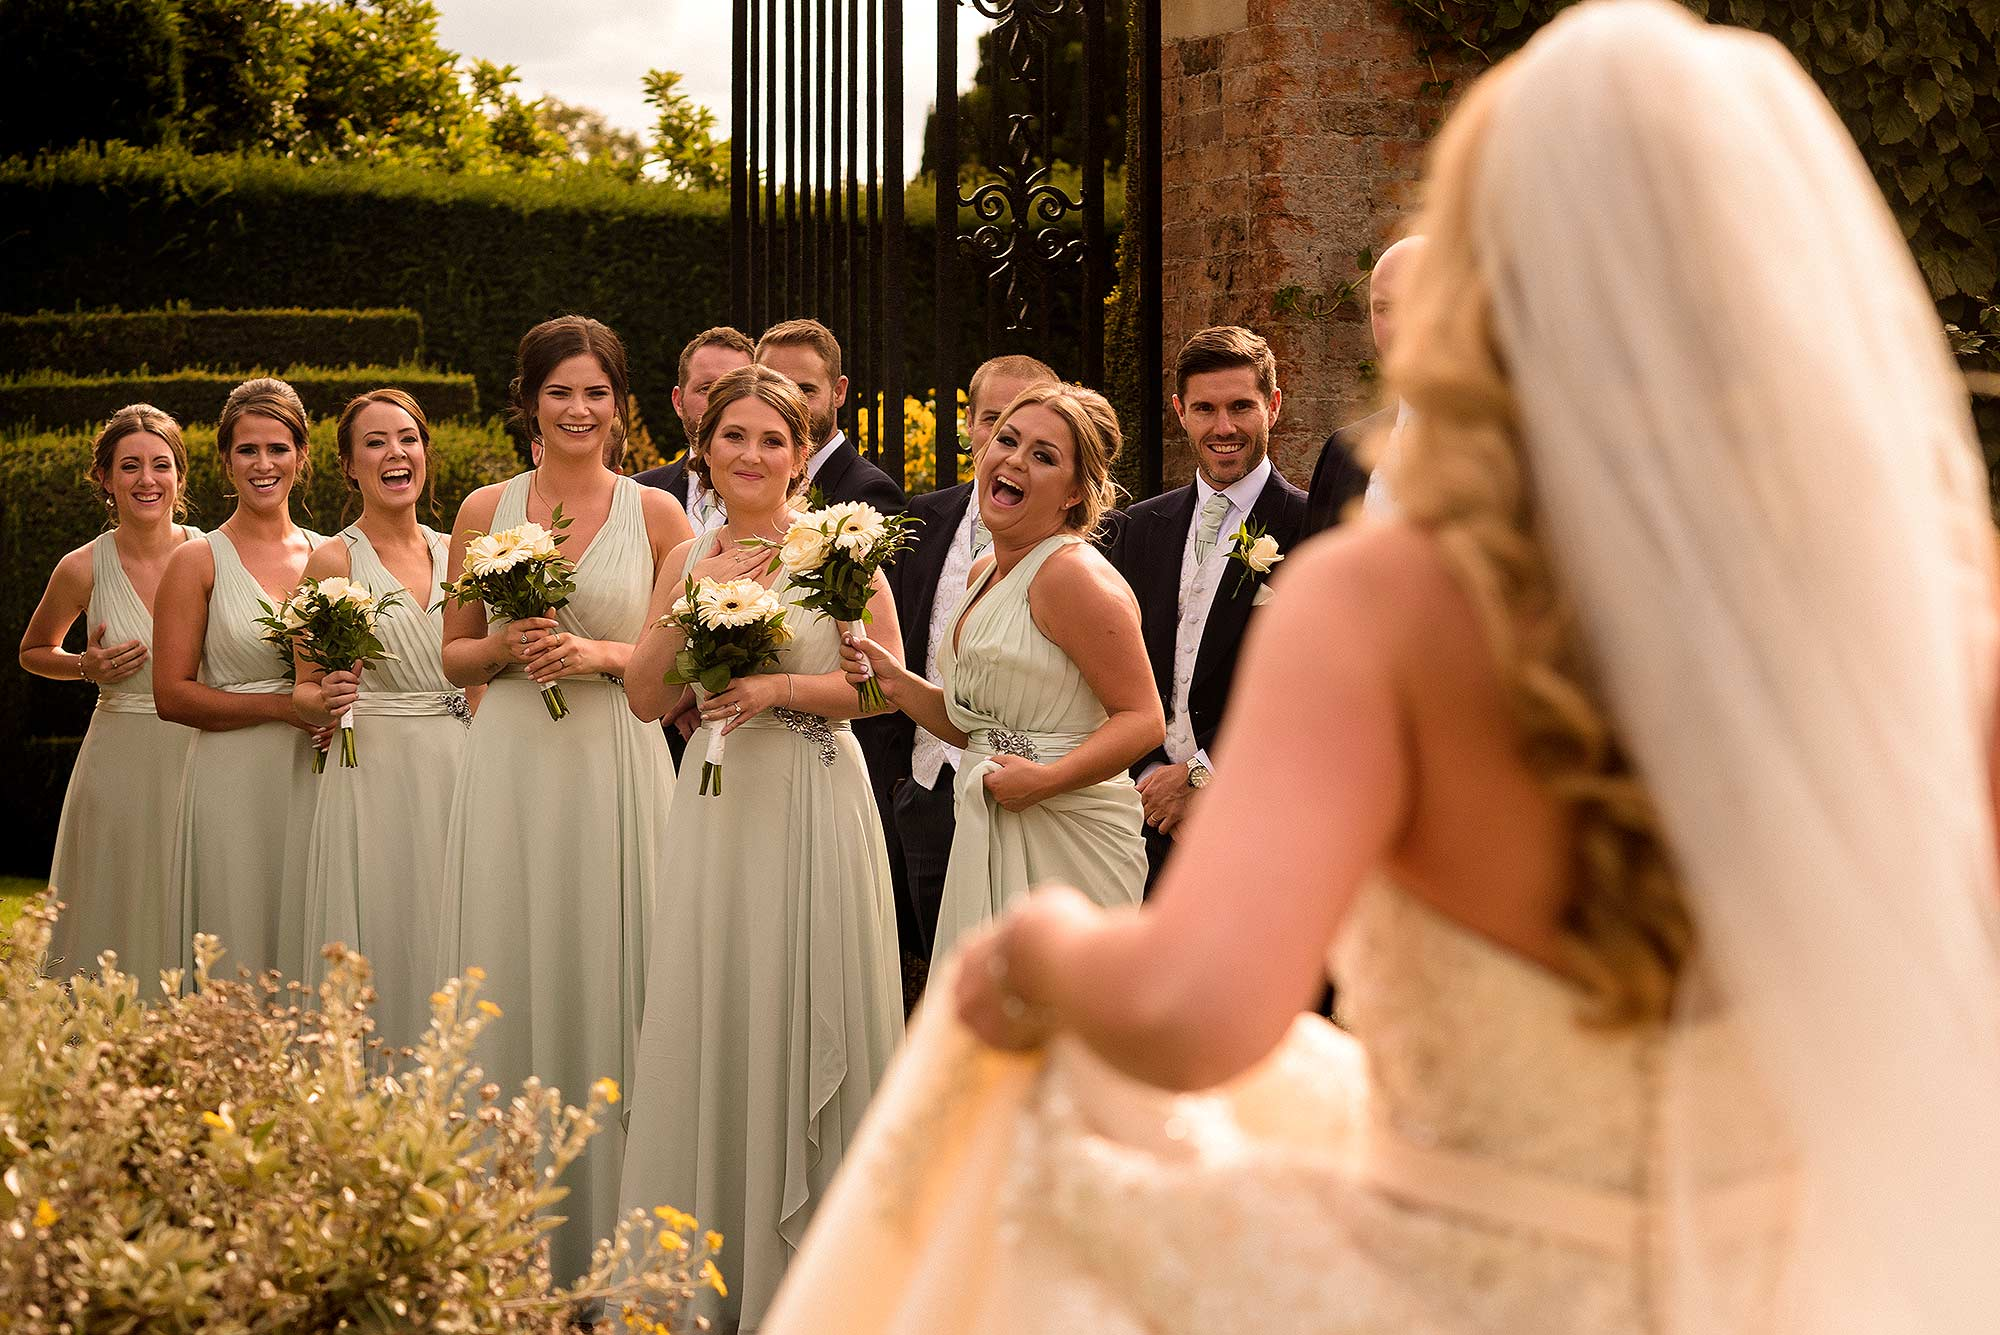 genuine fun photograph of bride walking towards bridesmaids